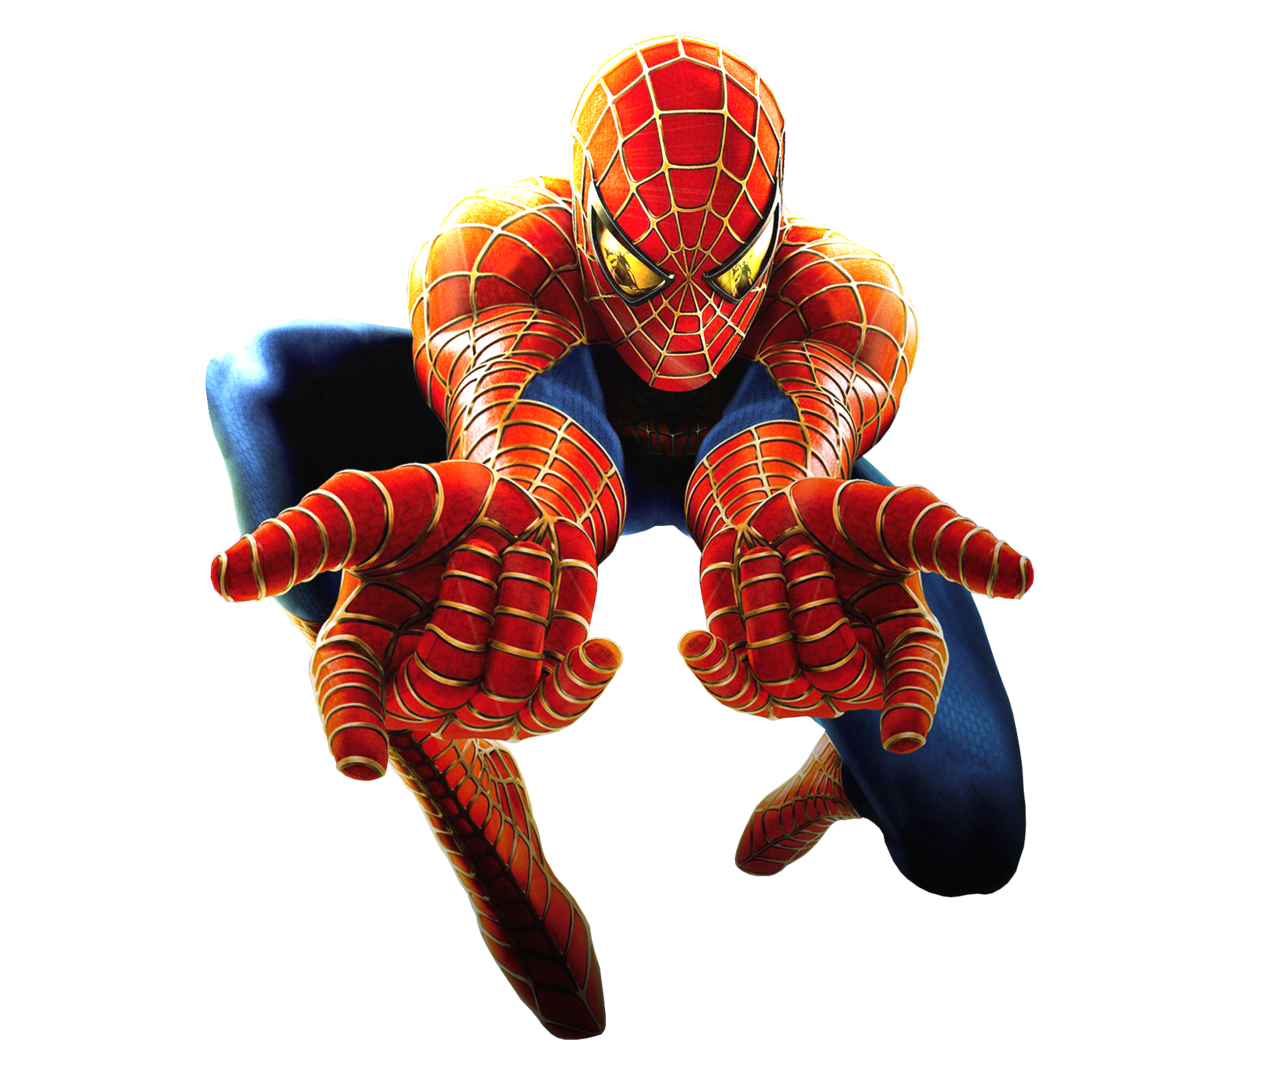 Spiderman shooting web clip art